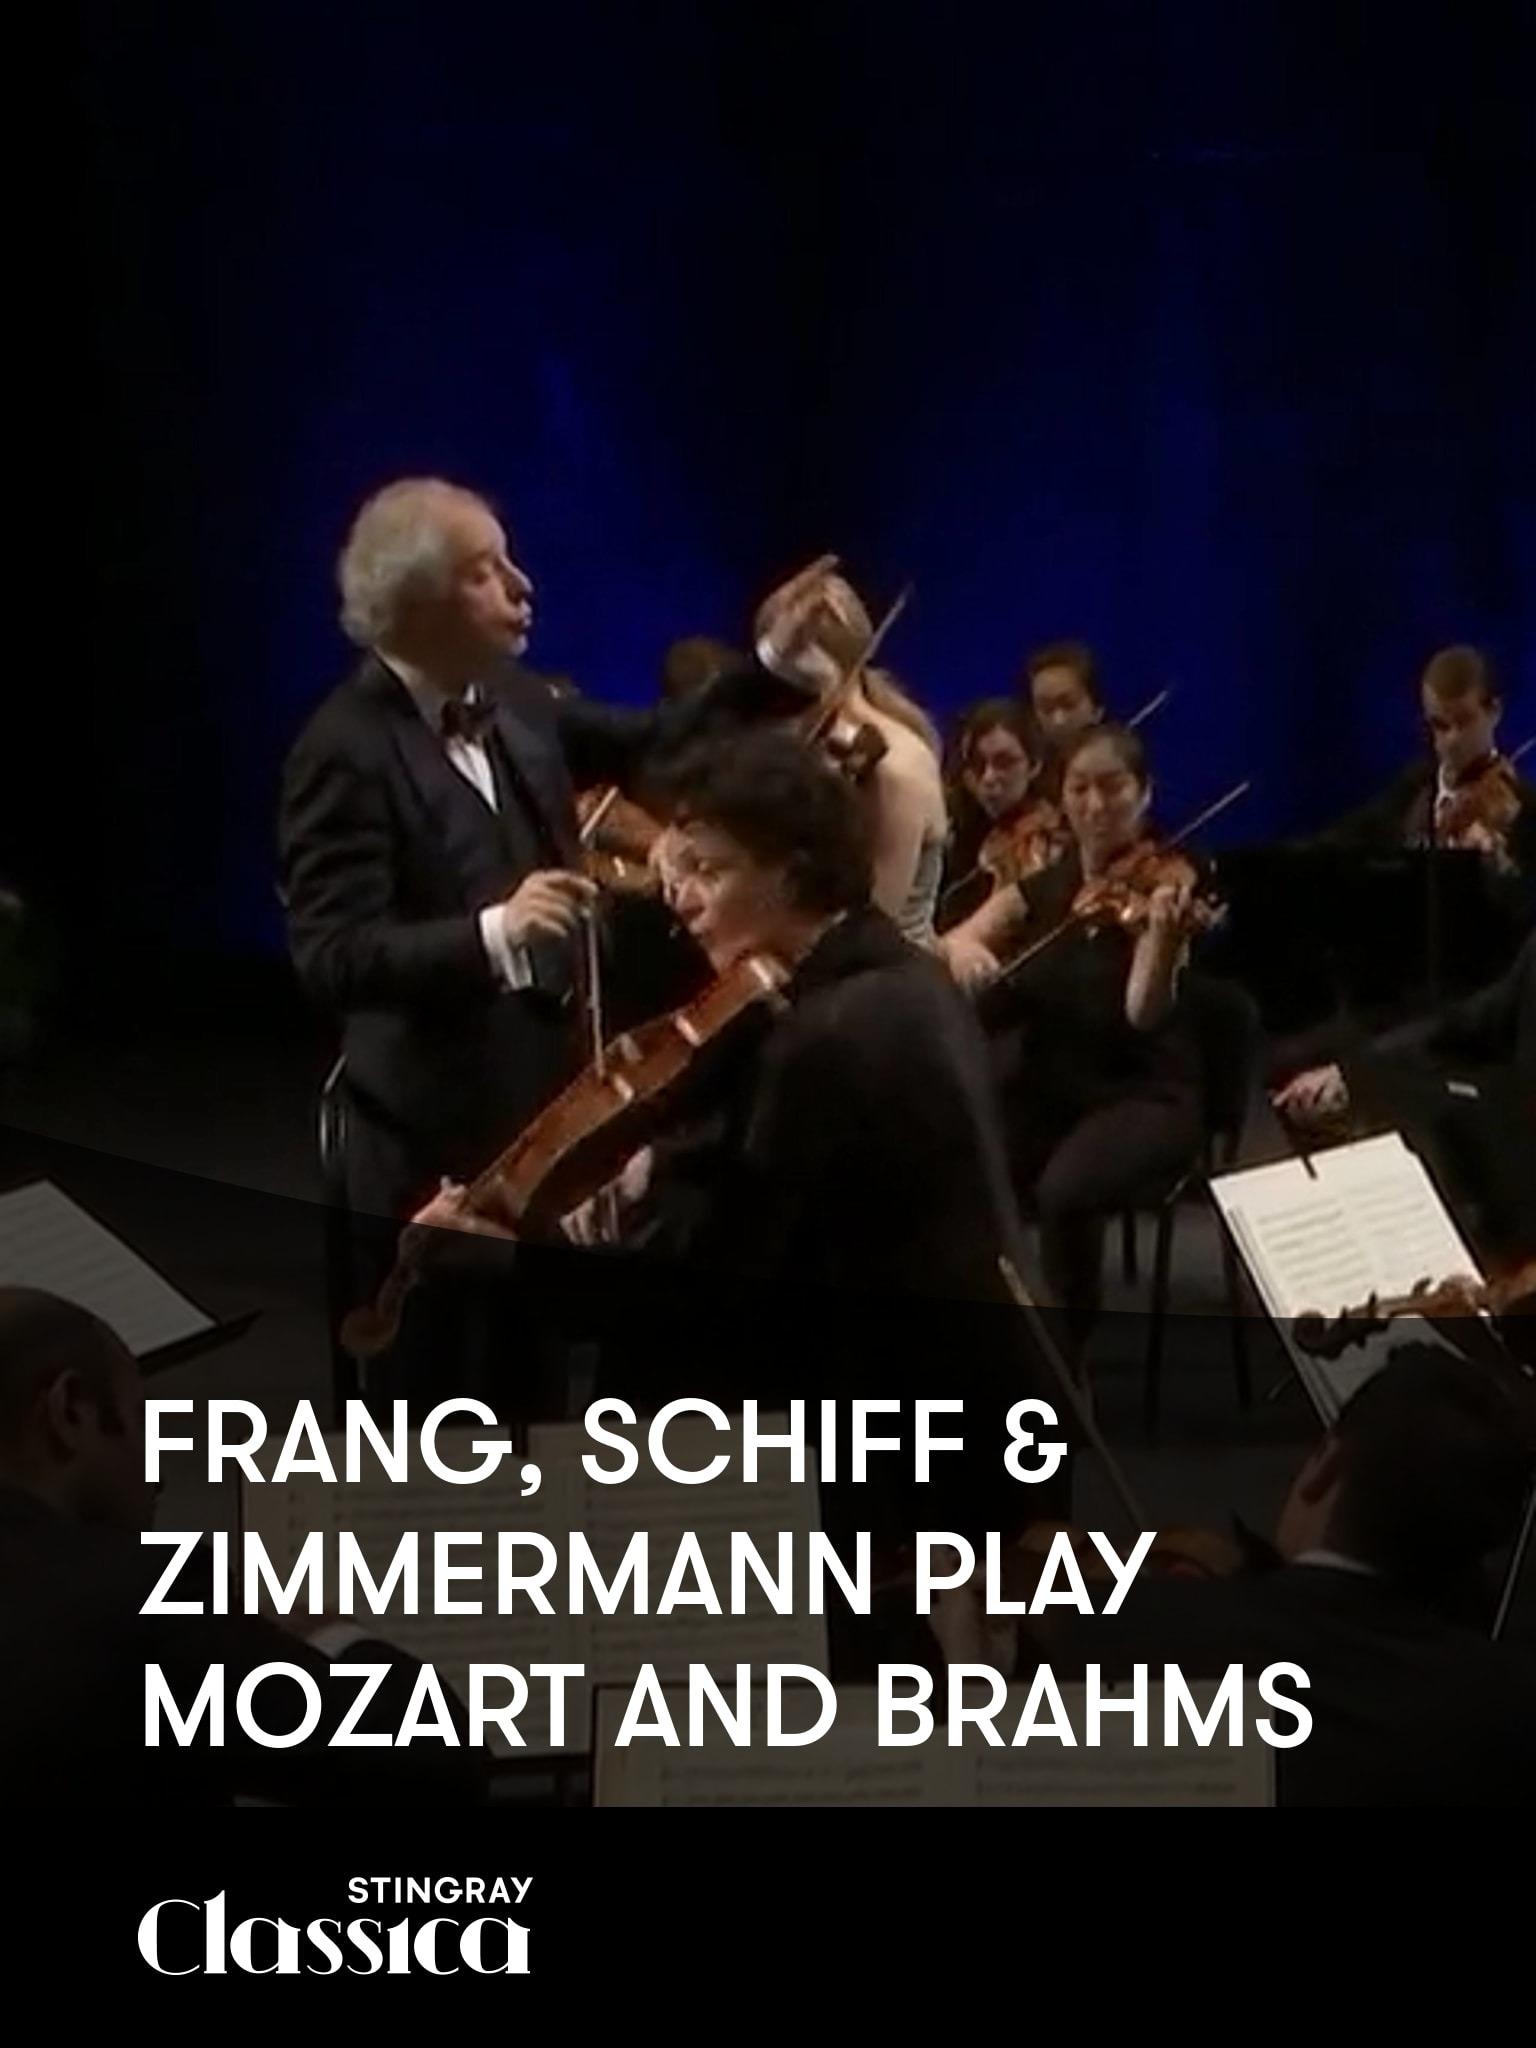 Frang, Schiff and Zimmermann spielen Mozart and Brahms